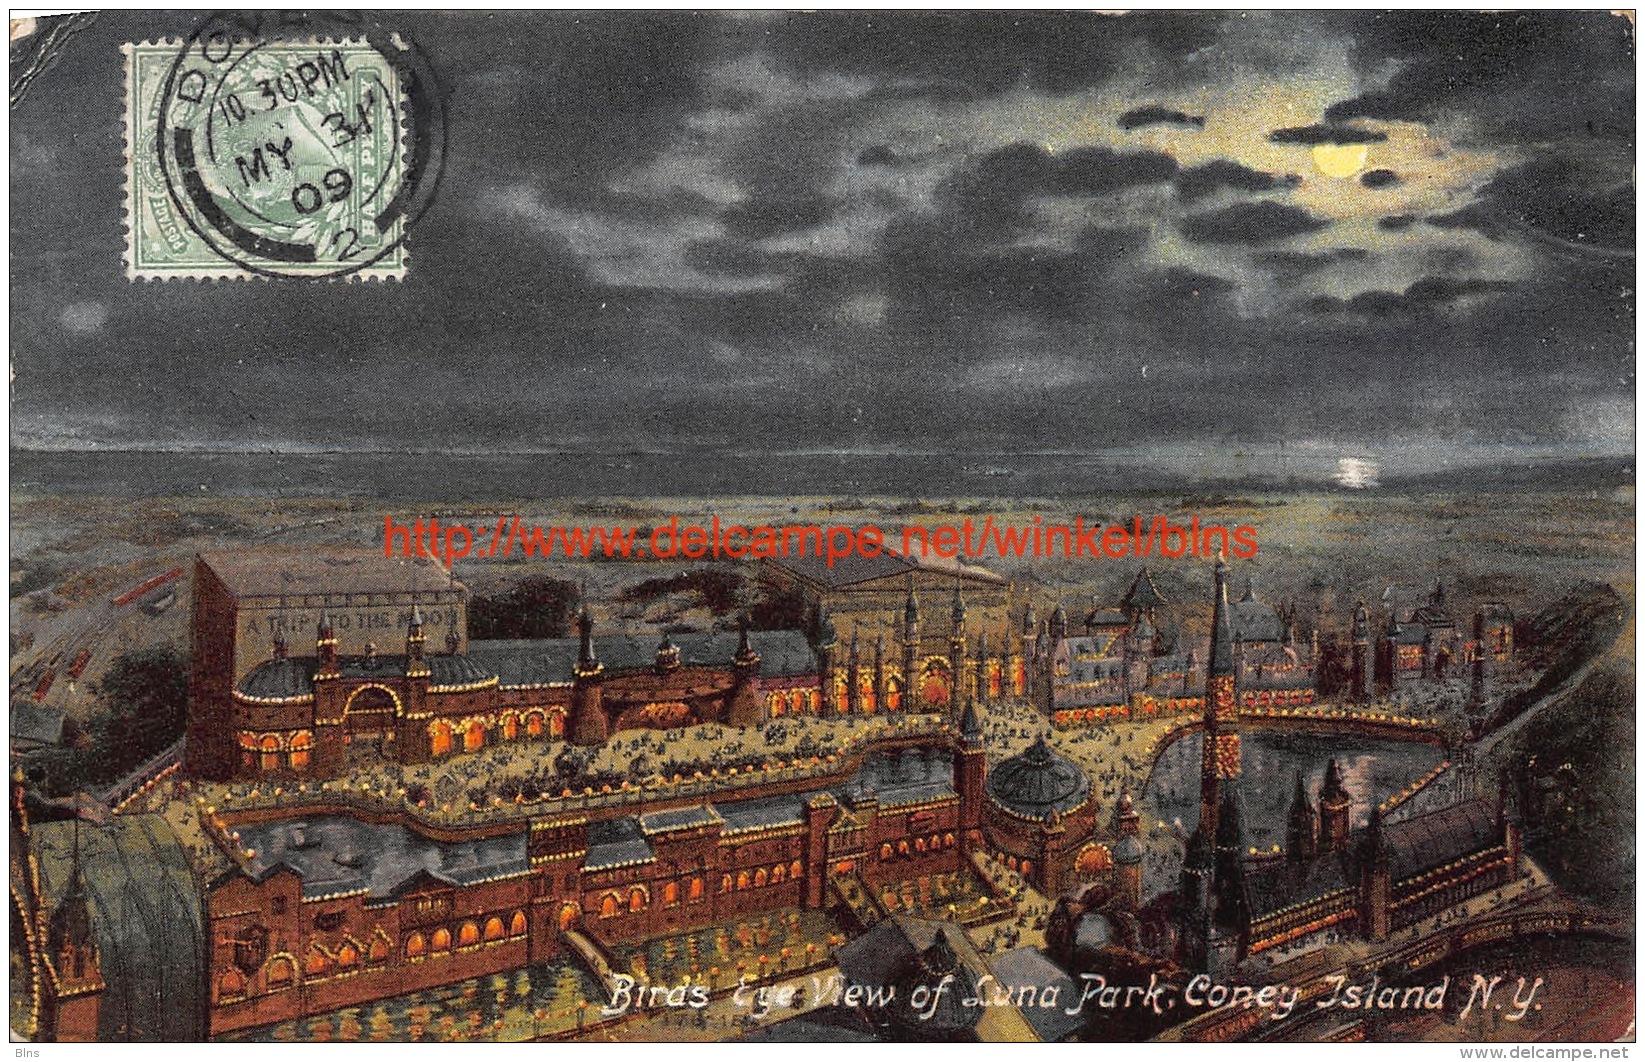 1909 Bird's Eye View Of Luna Park Coney Island New York - NY - New York